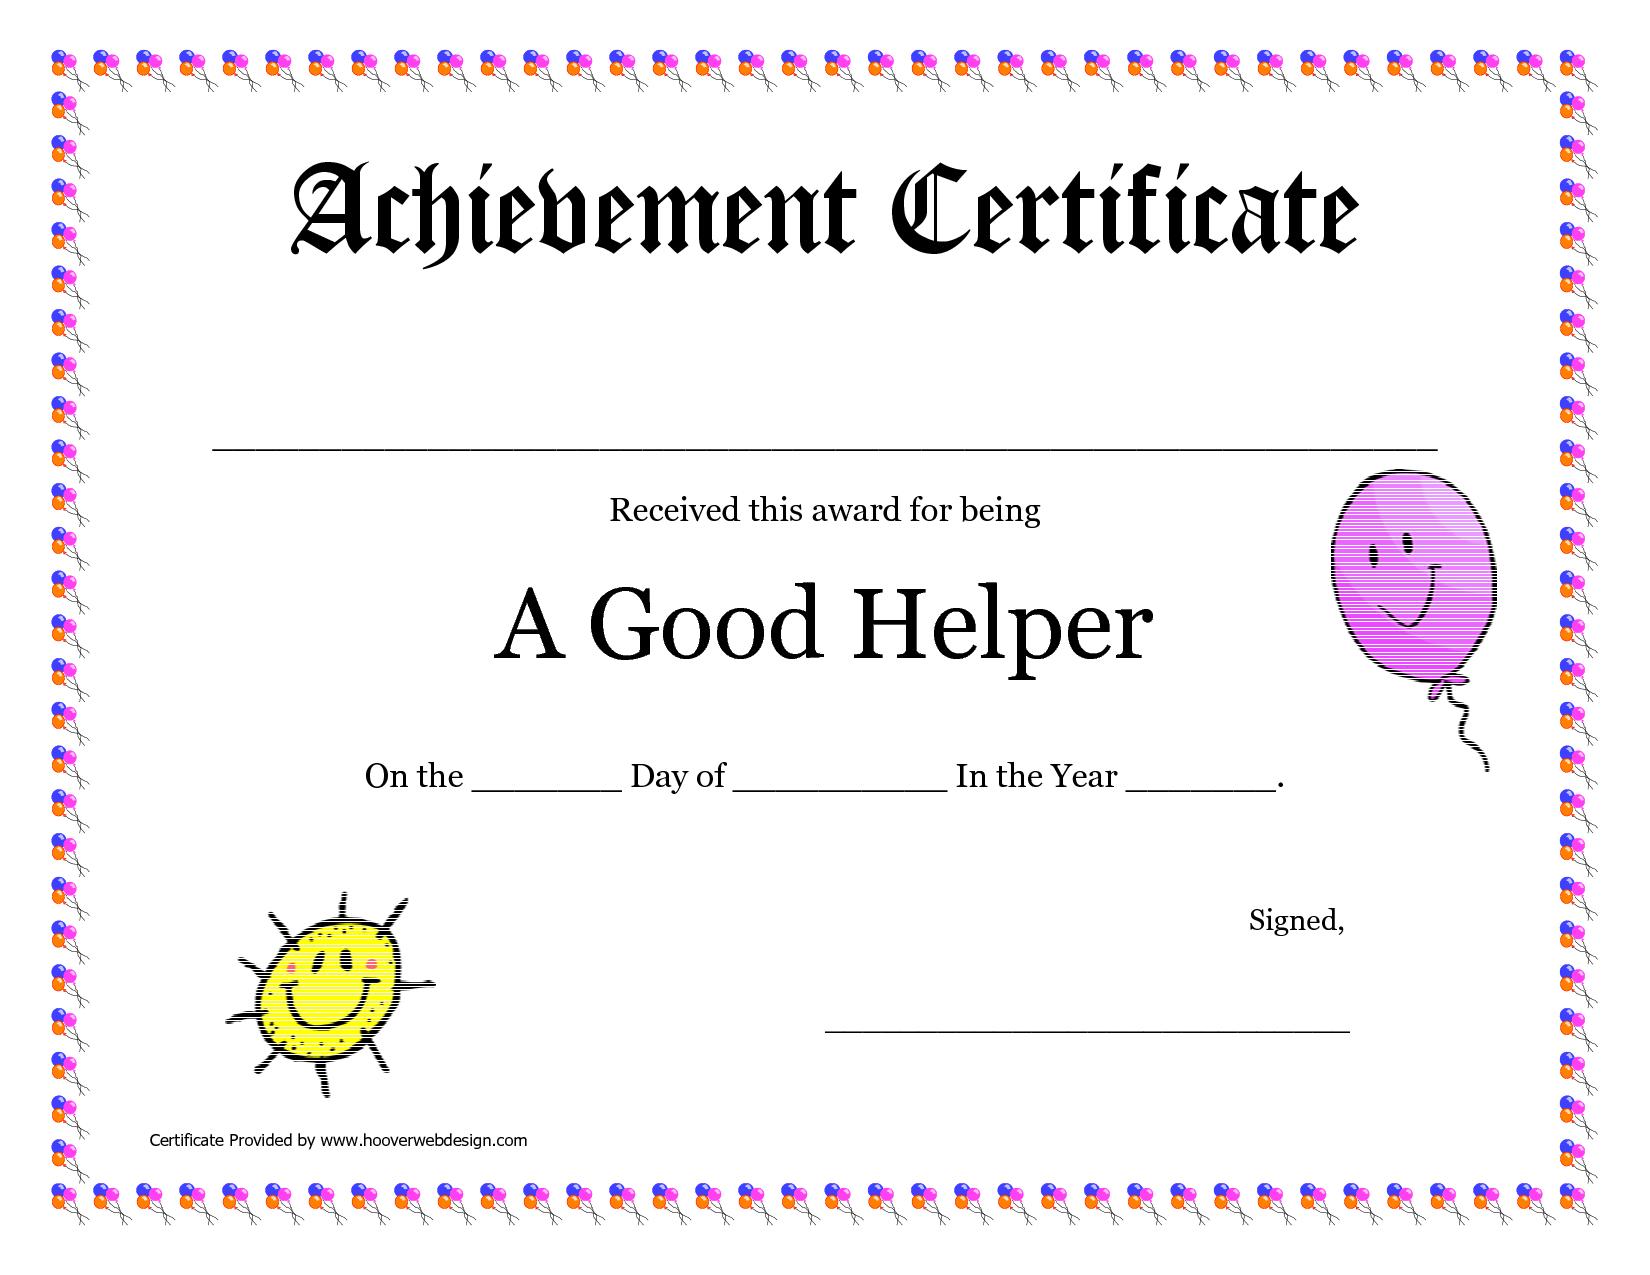 Printable Award Certificates For Teachers | Good Helper Printable - Free Printable School Achievement Certificates